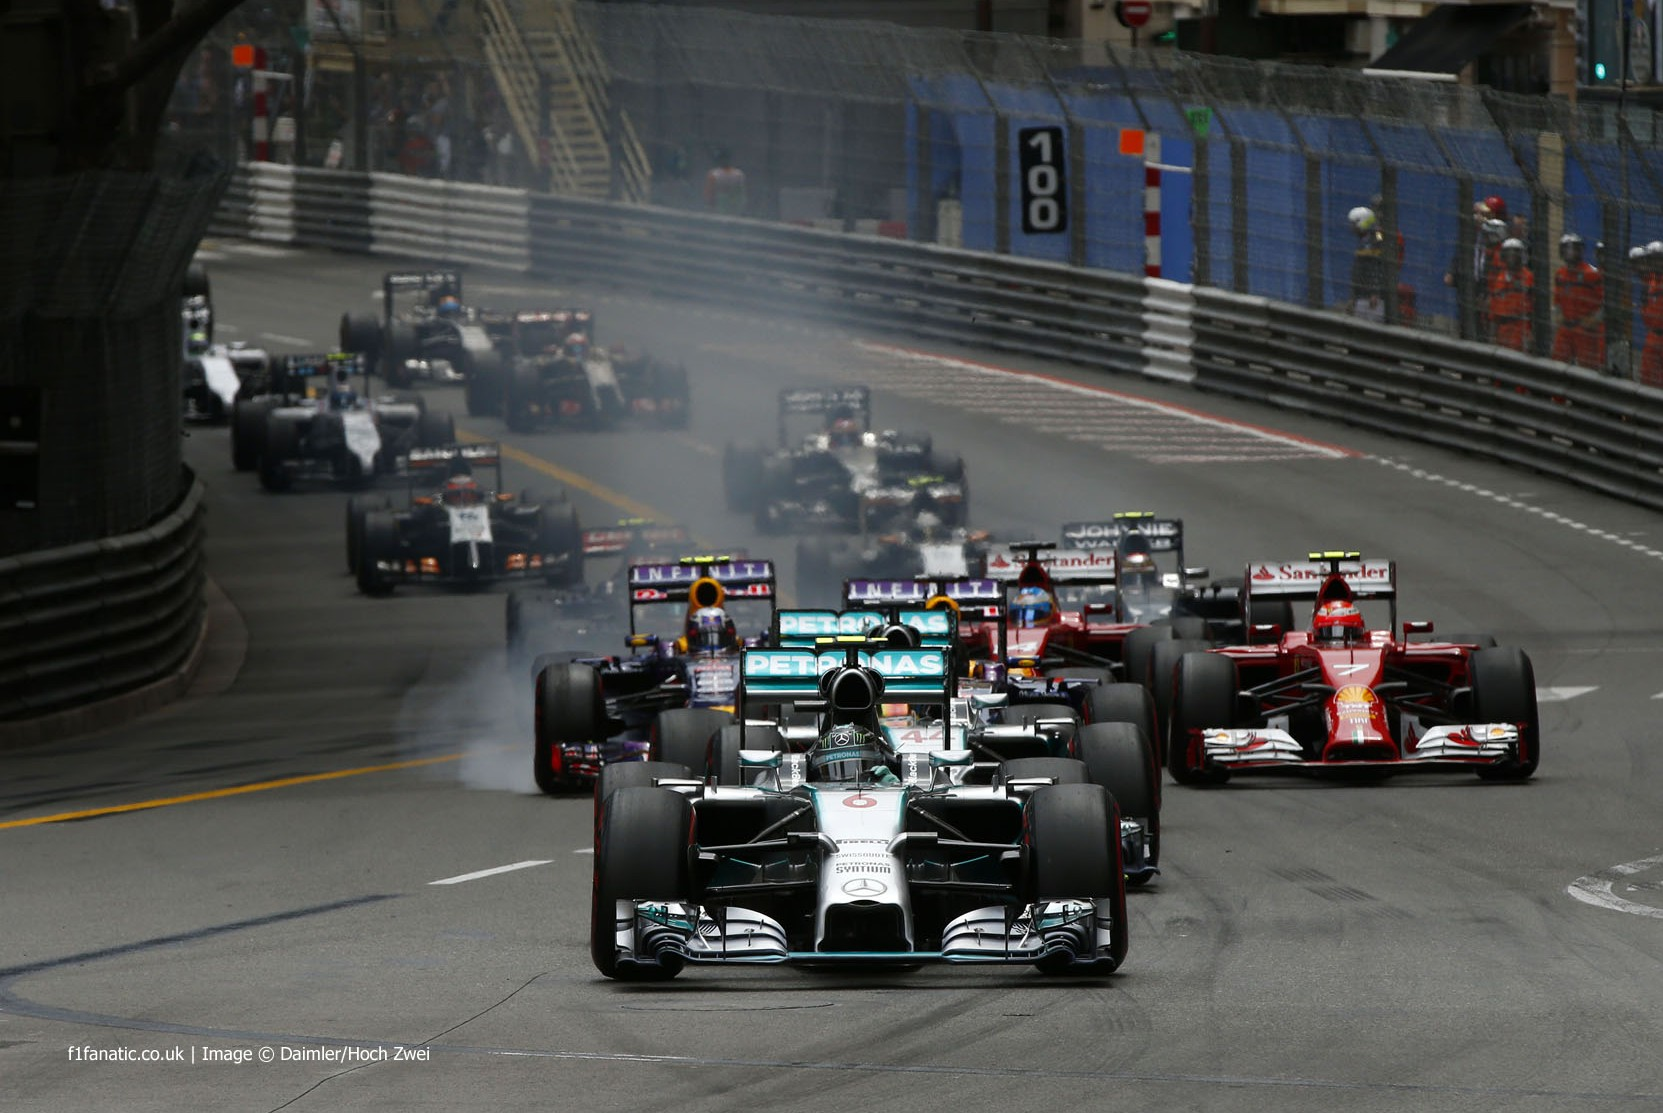 F1 / Mónaco: la meteorología de la carrera